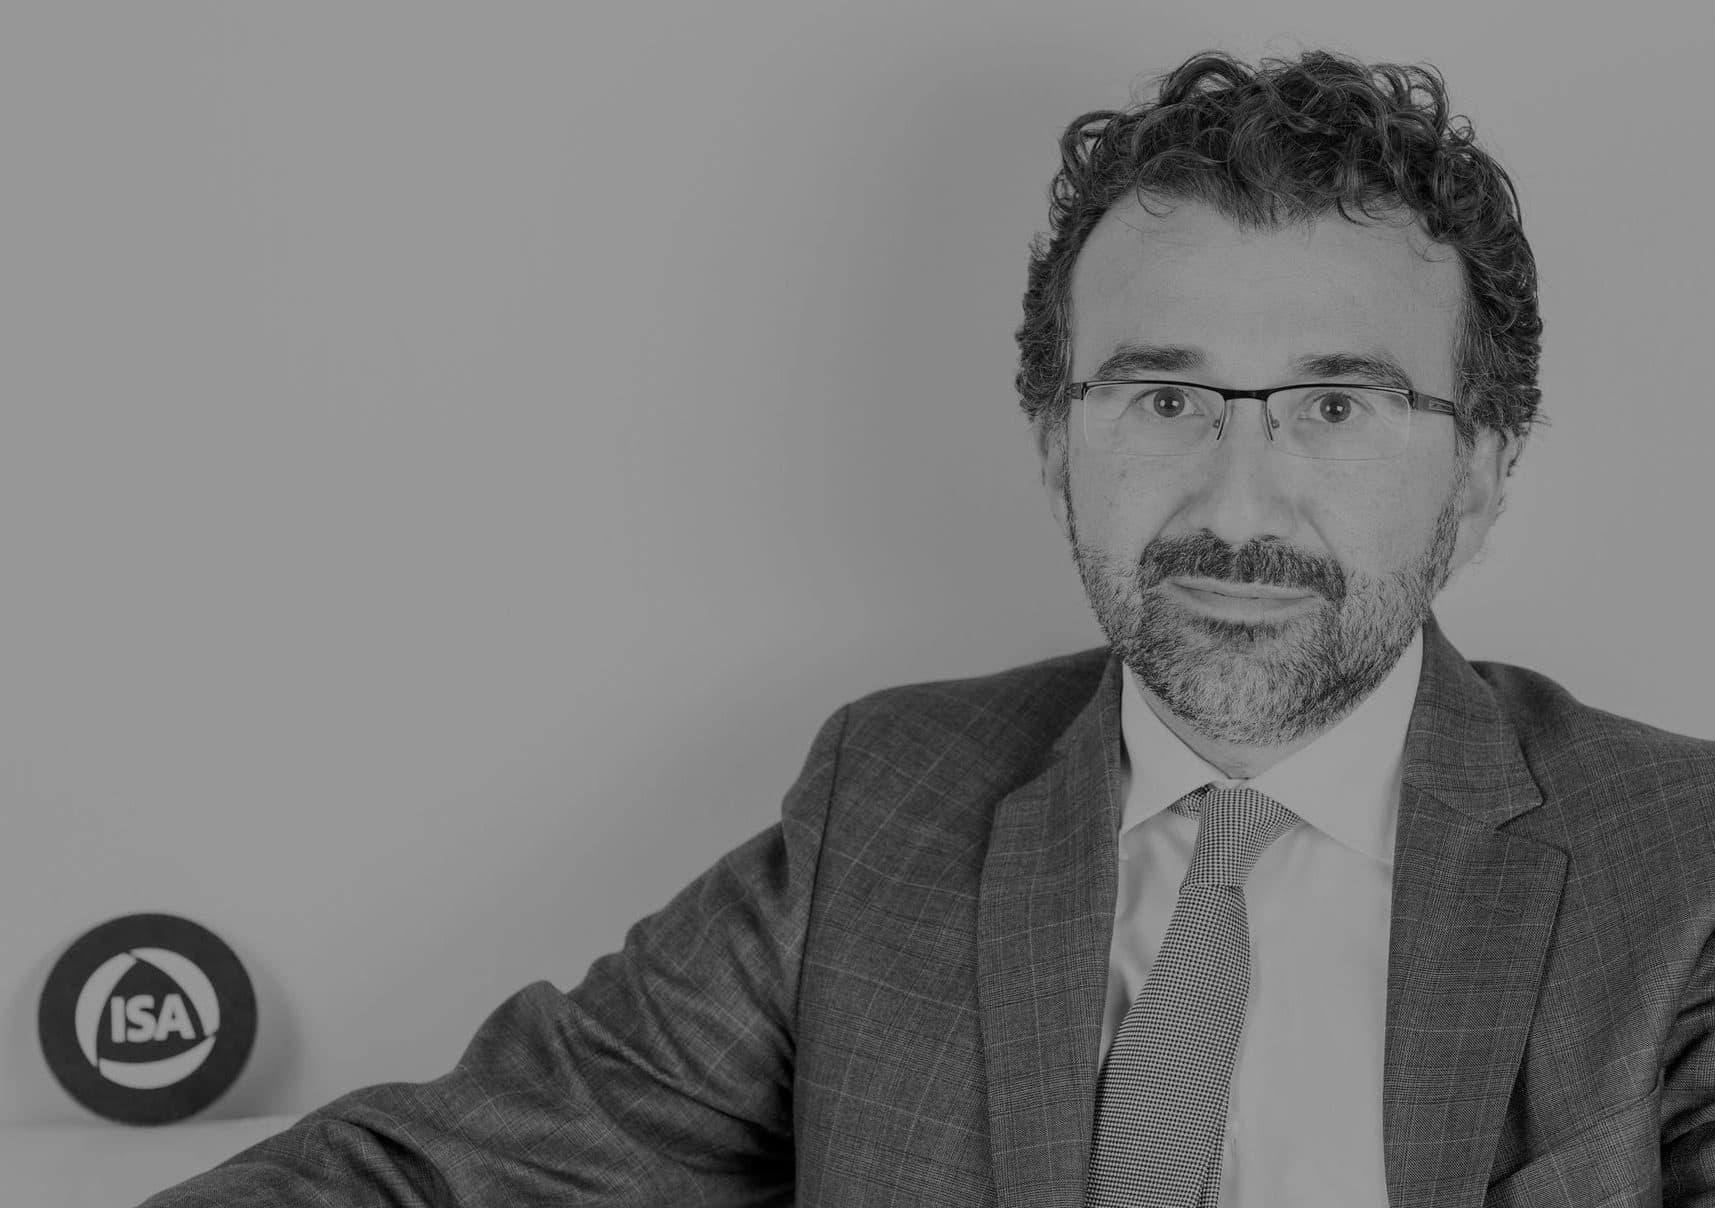 Juan Manuel Ferrer